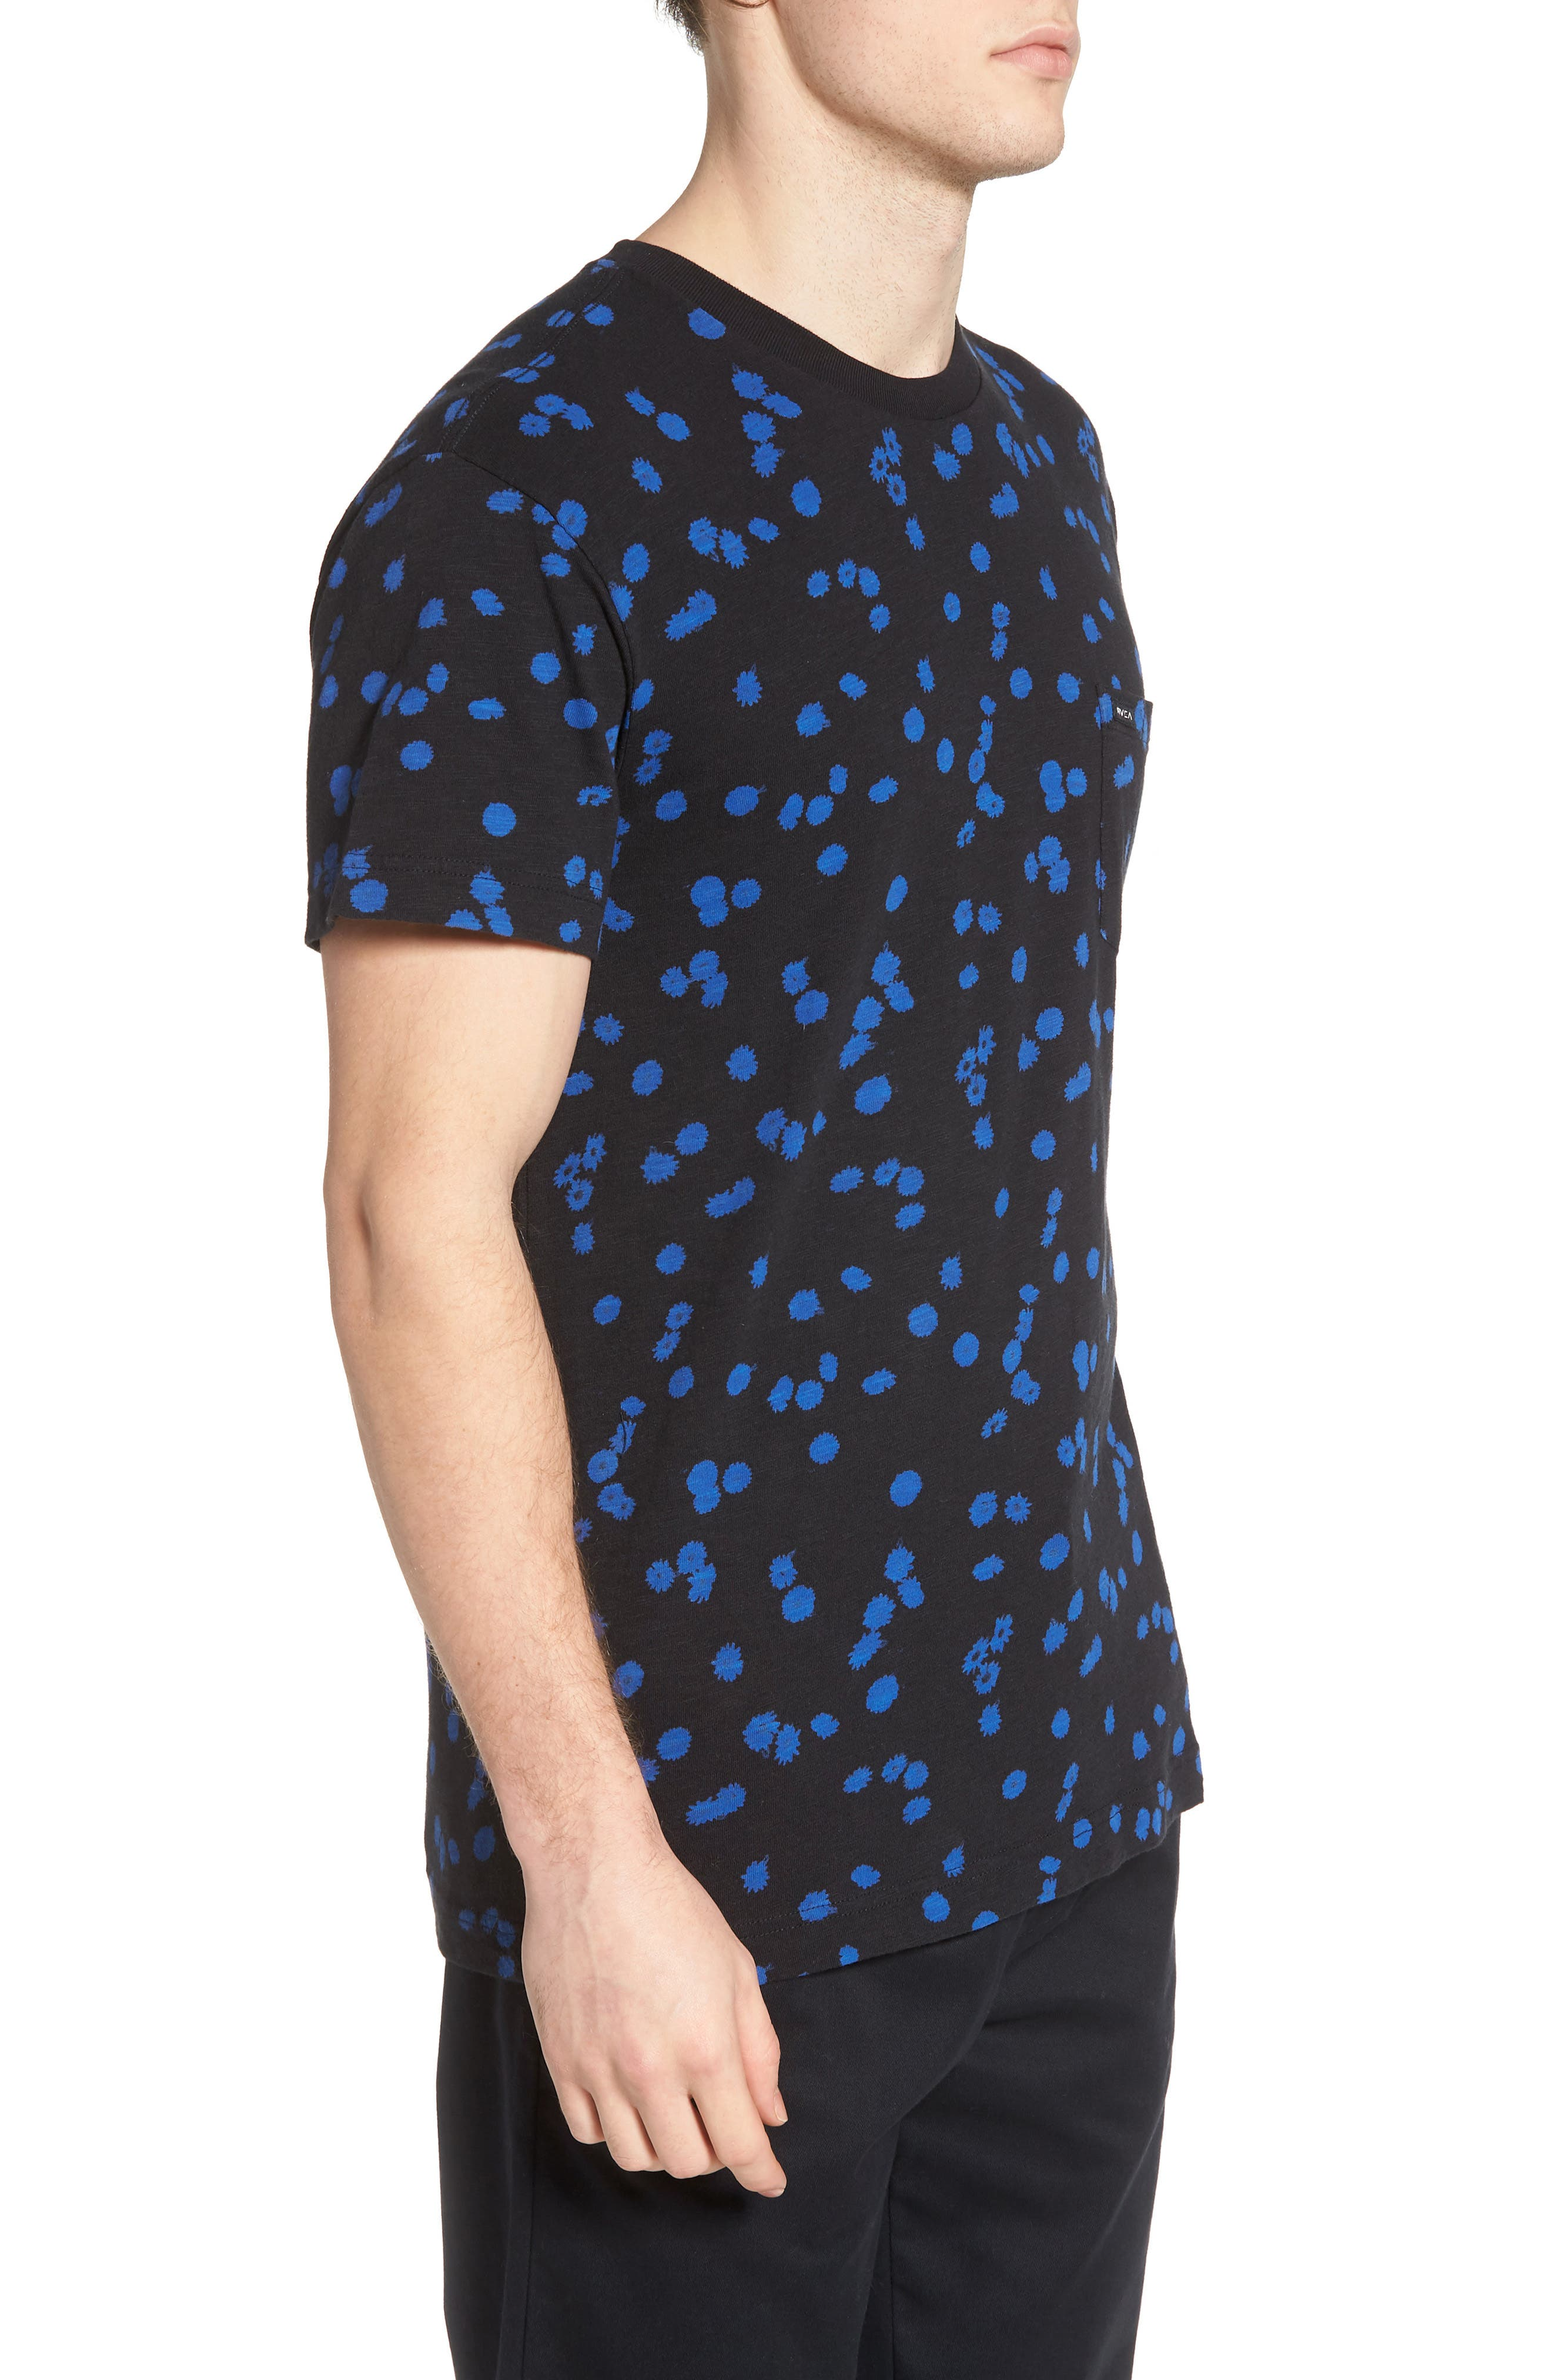 OD Floral T-Shirt,                             Alternate thumbnail 3, color,                             Black